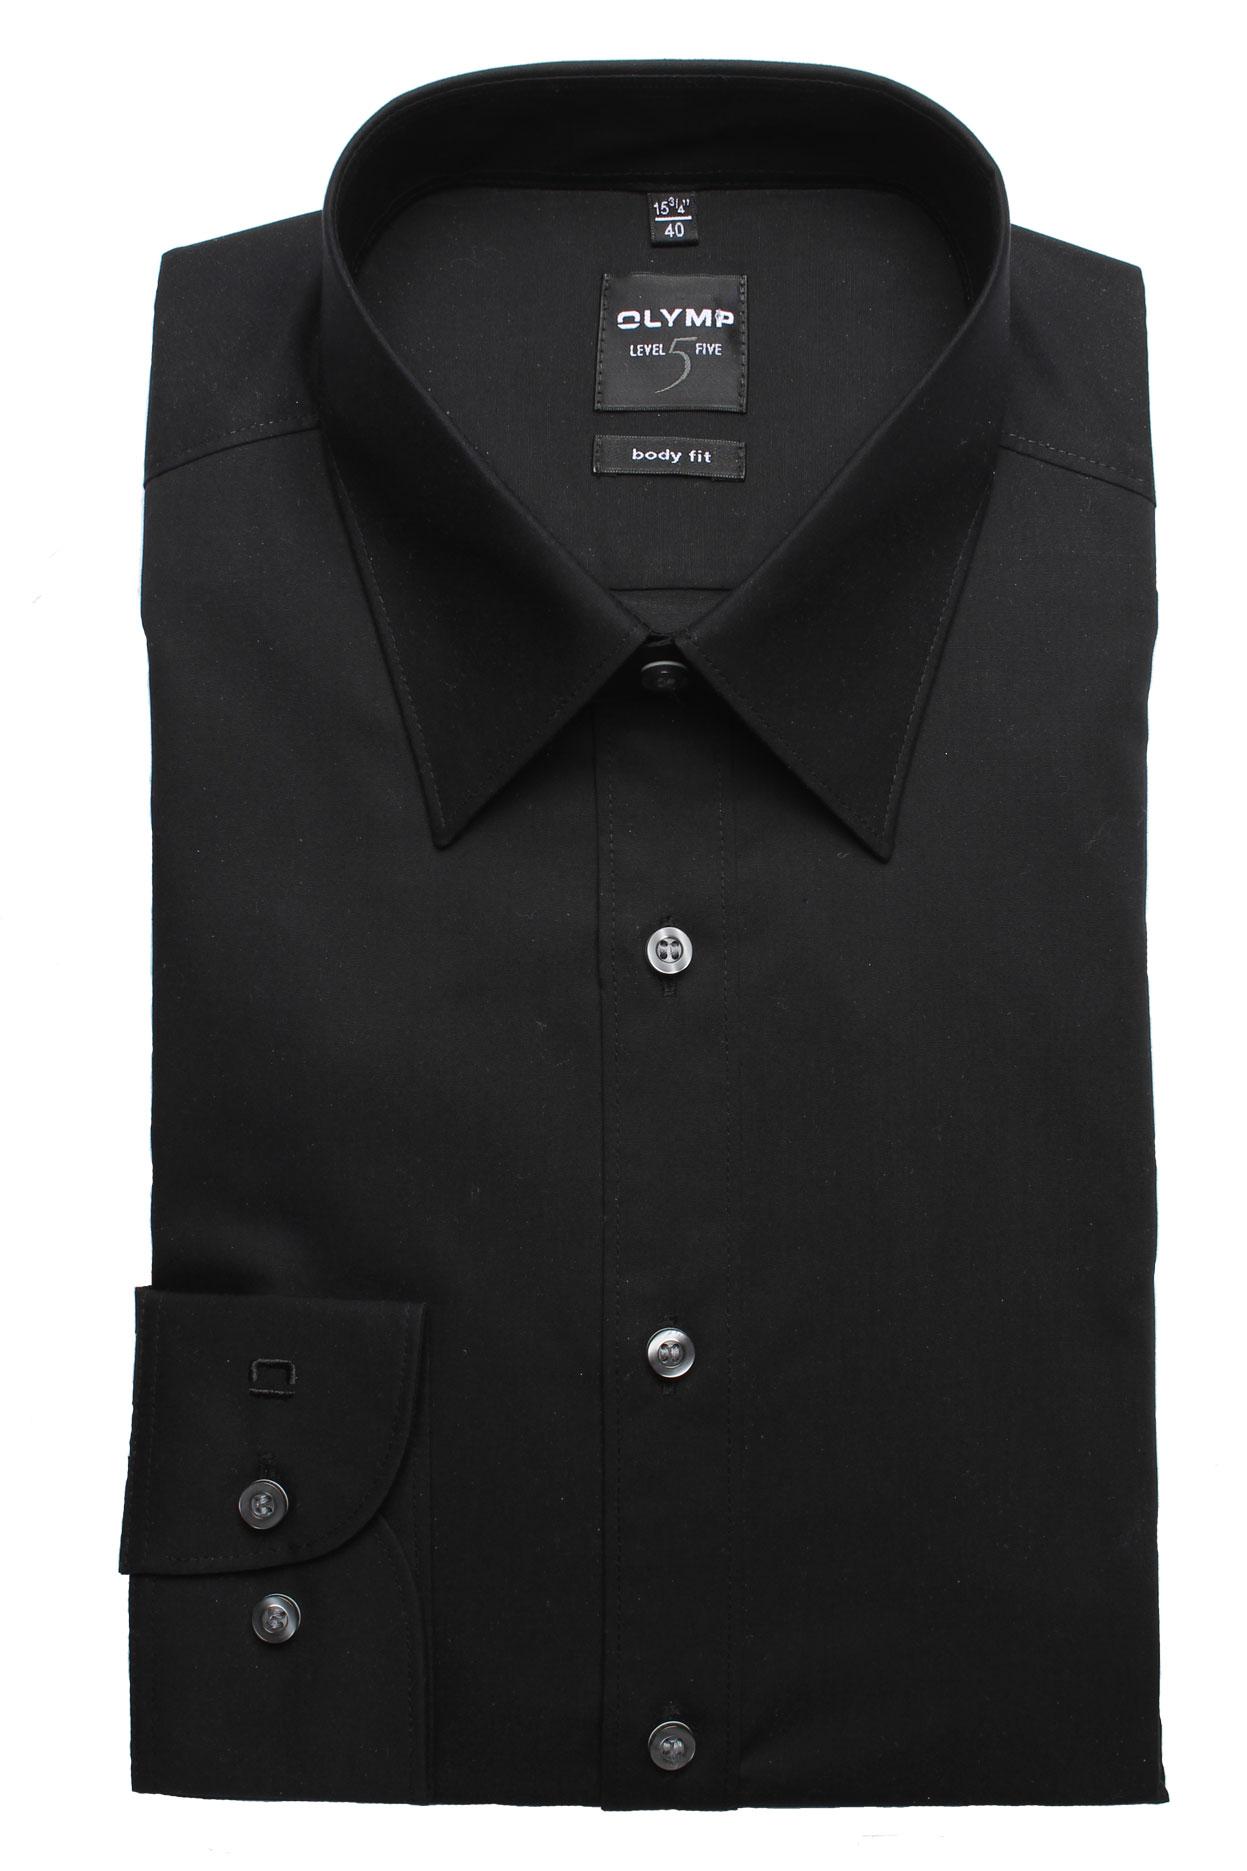 OLYMP Shirt 609064 68 schwarz 609064 zwart Maat 40